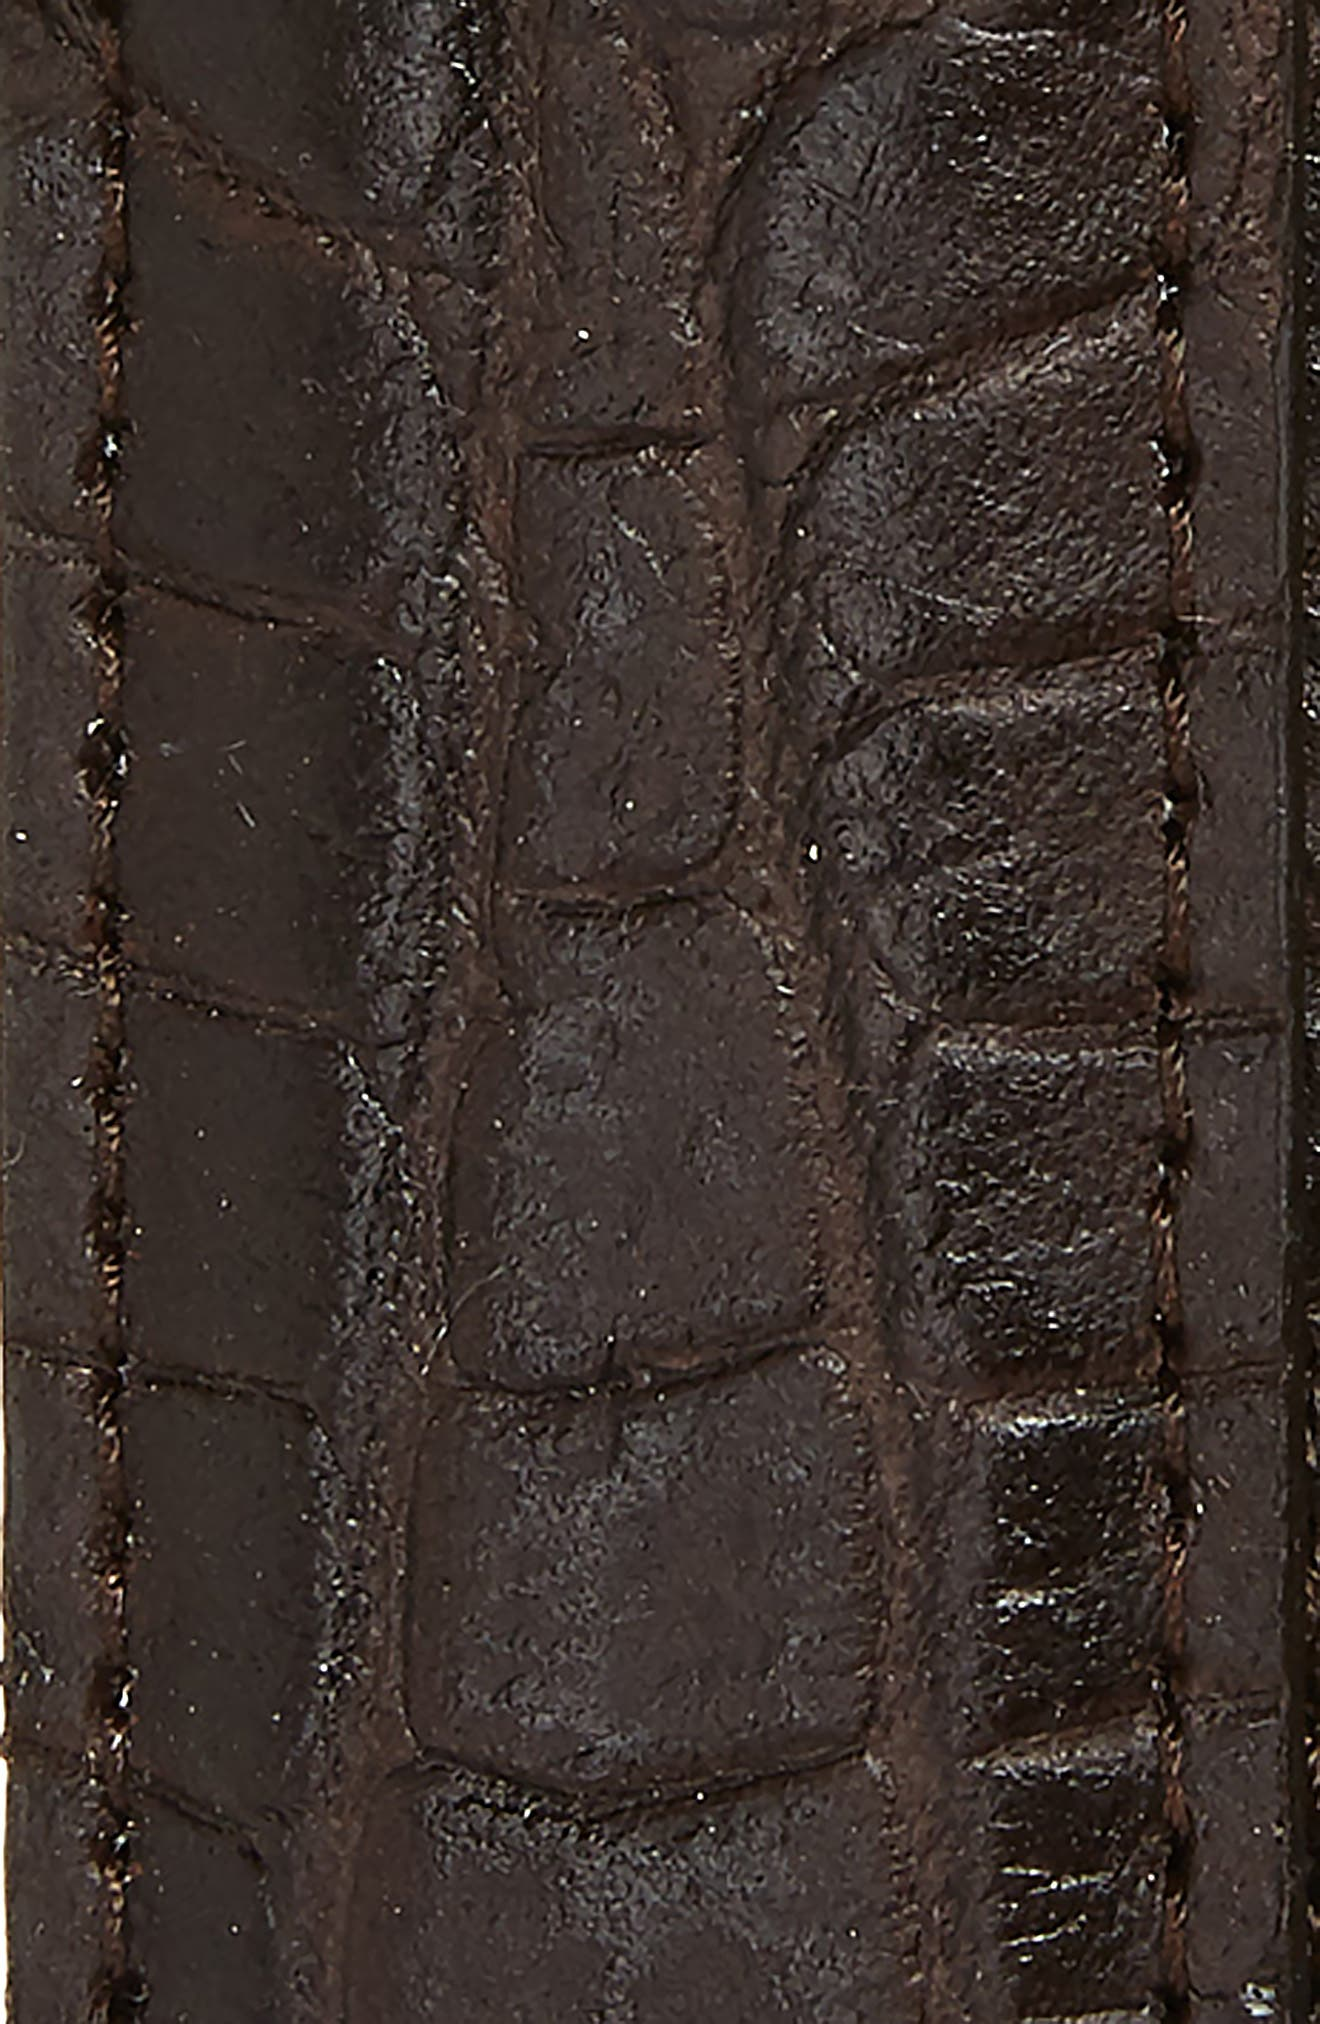 Croc Embossed Leather Belt,                             Alternate thumbnail 2, color,                             BROWN